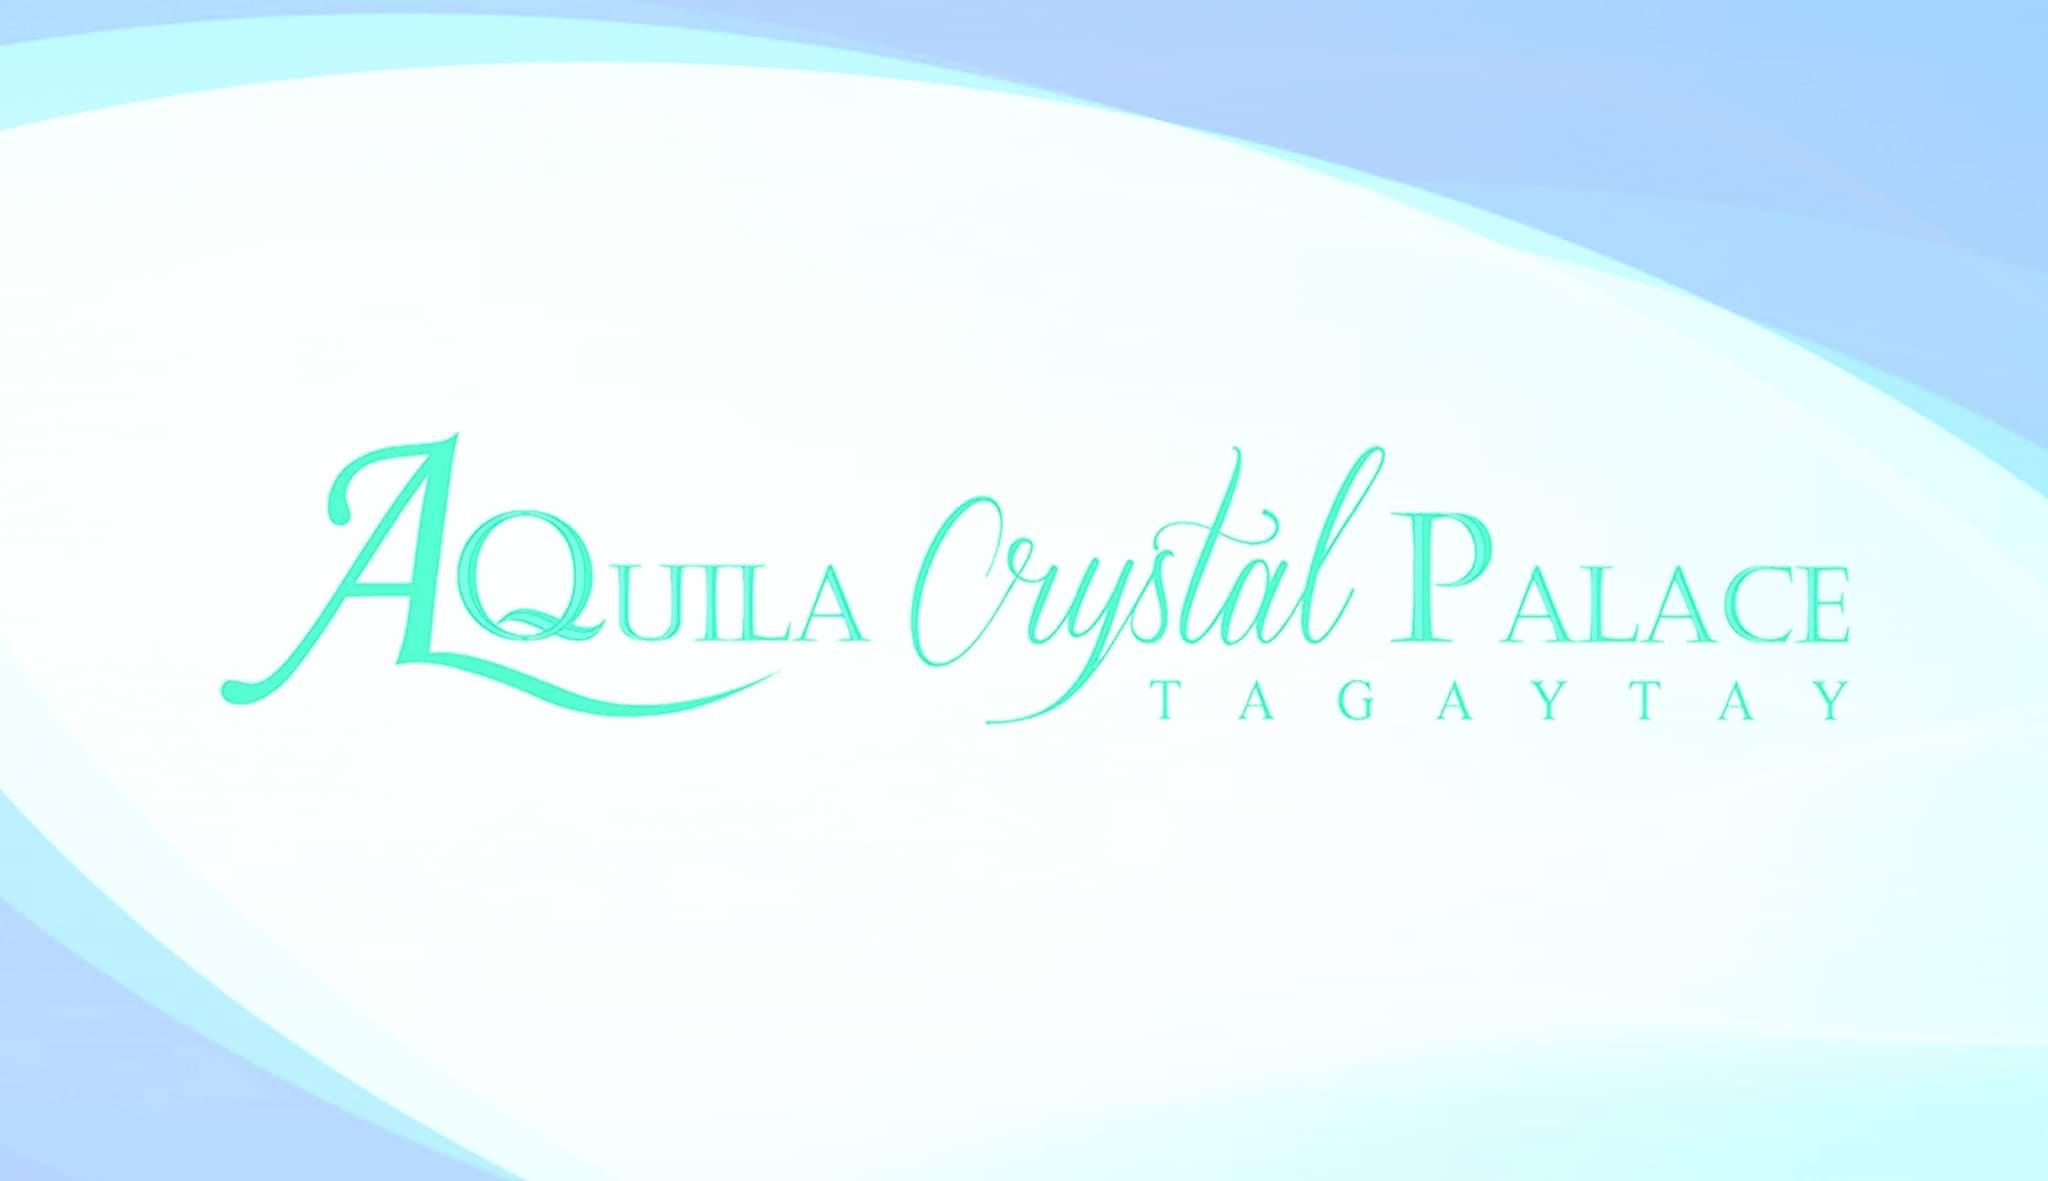 AQUILA CRYSTAL PALACE TAGAYTAY